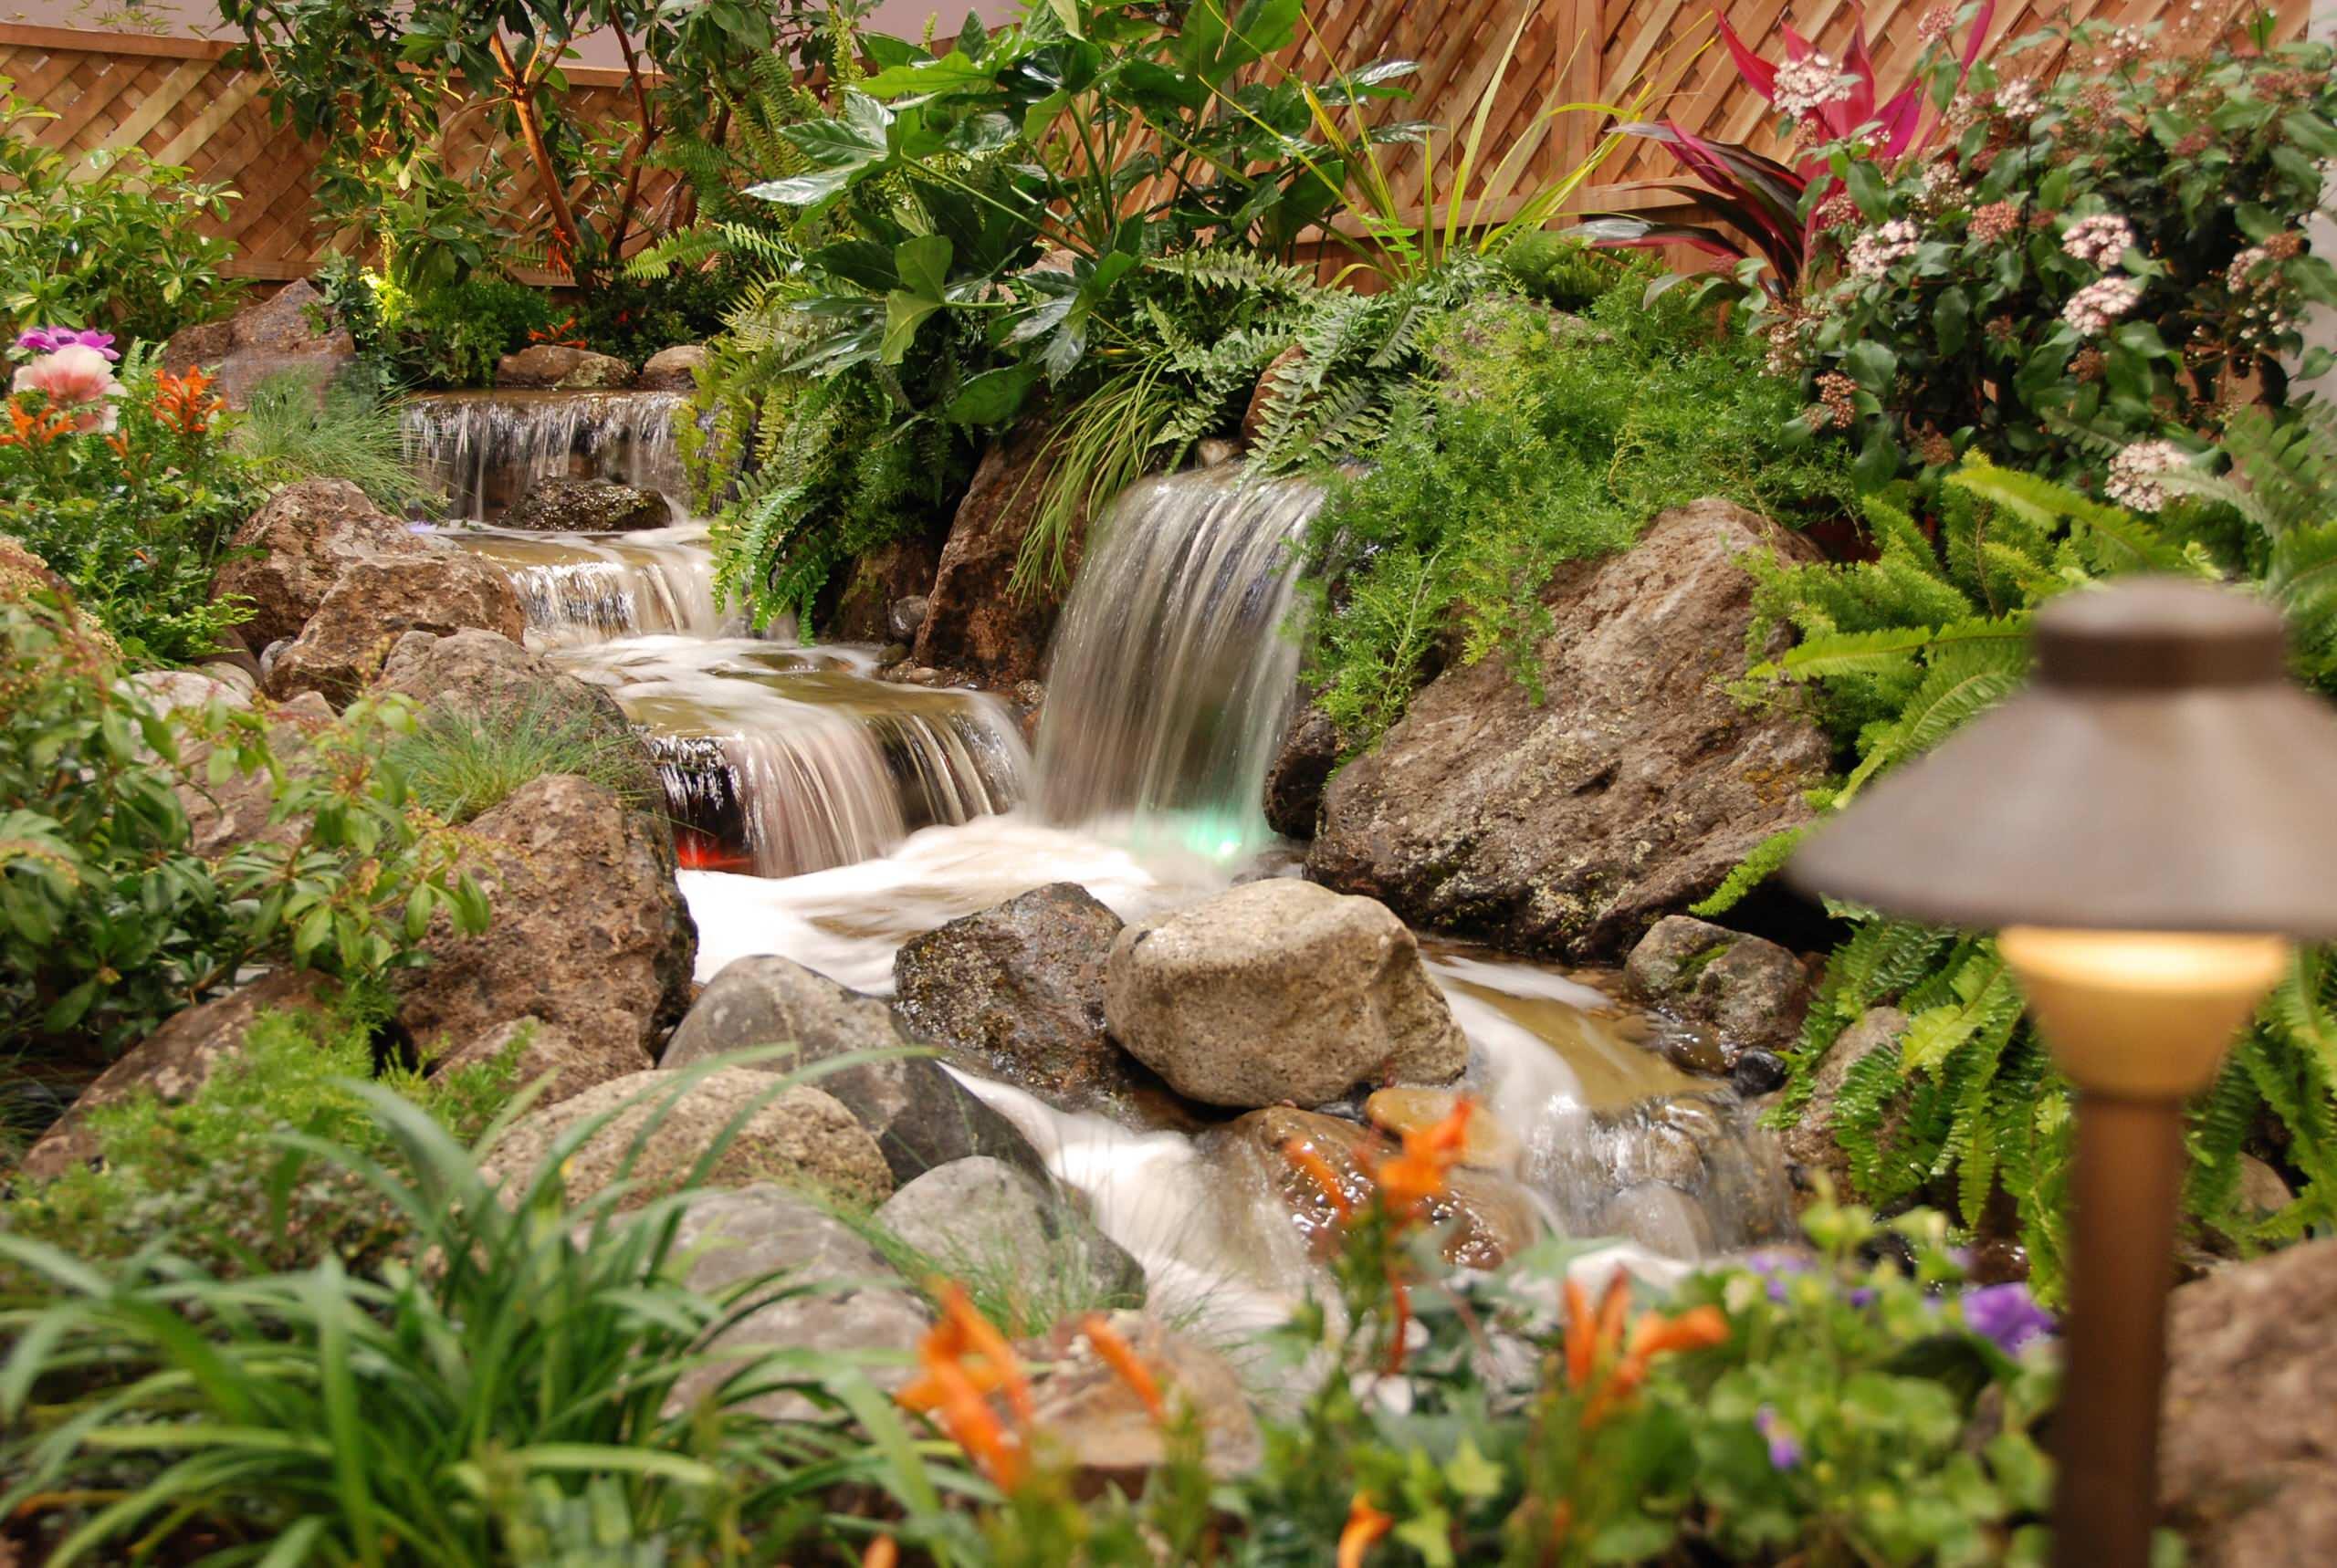 Waterfalls by Jpm